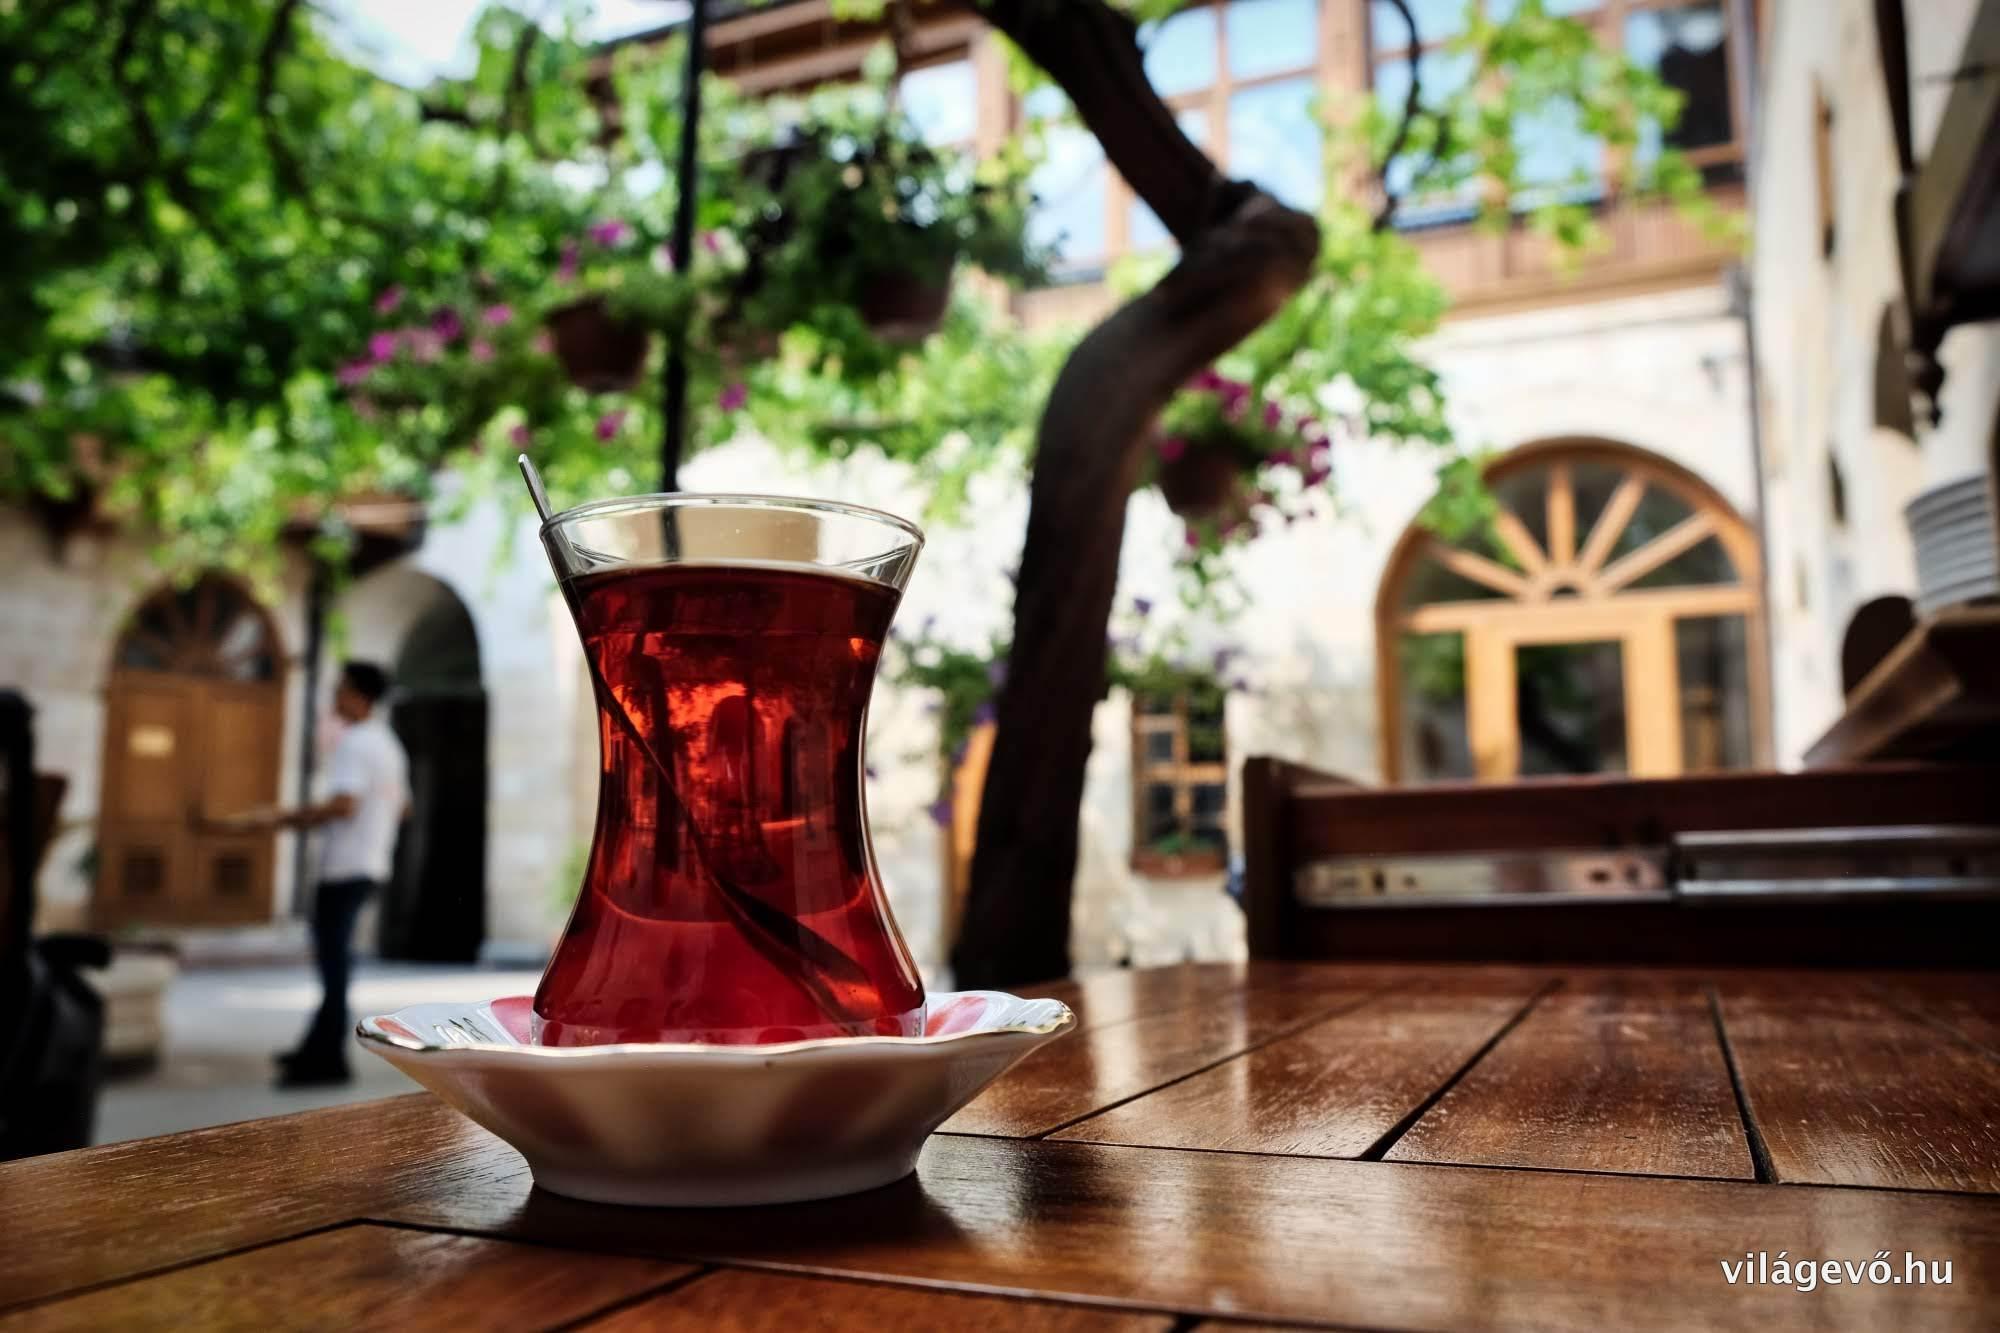 dscf4940_turkey_anatolia_mesopotamia_jokuti_vilagevo_l.jpg